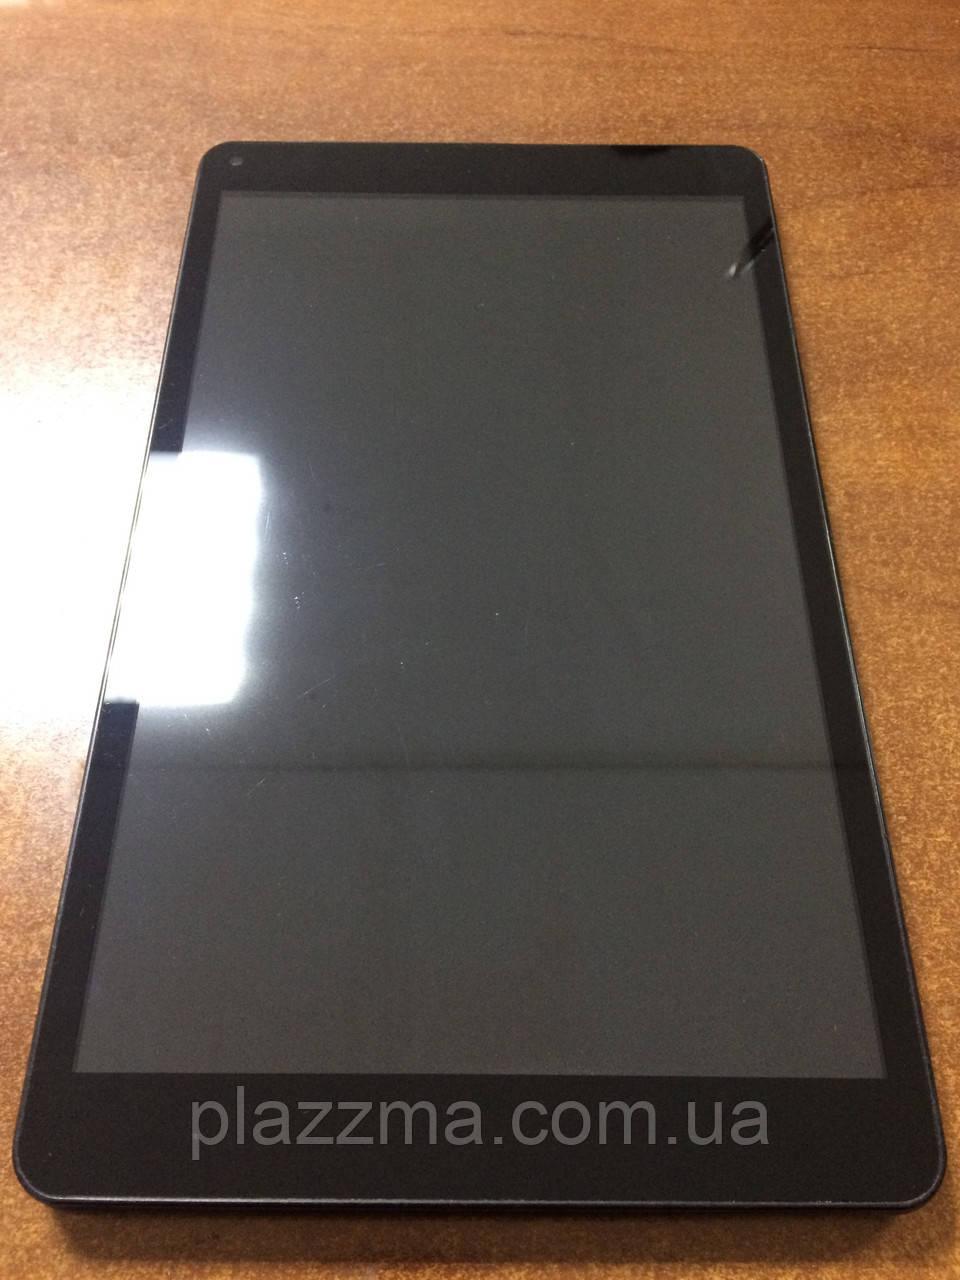 Планшет Impression ImPad M101 на запчасти или восстановление